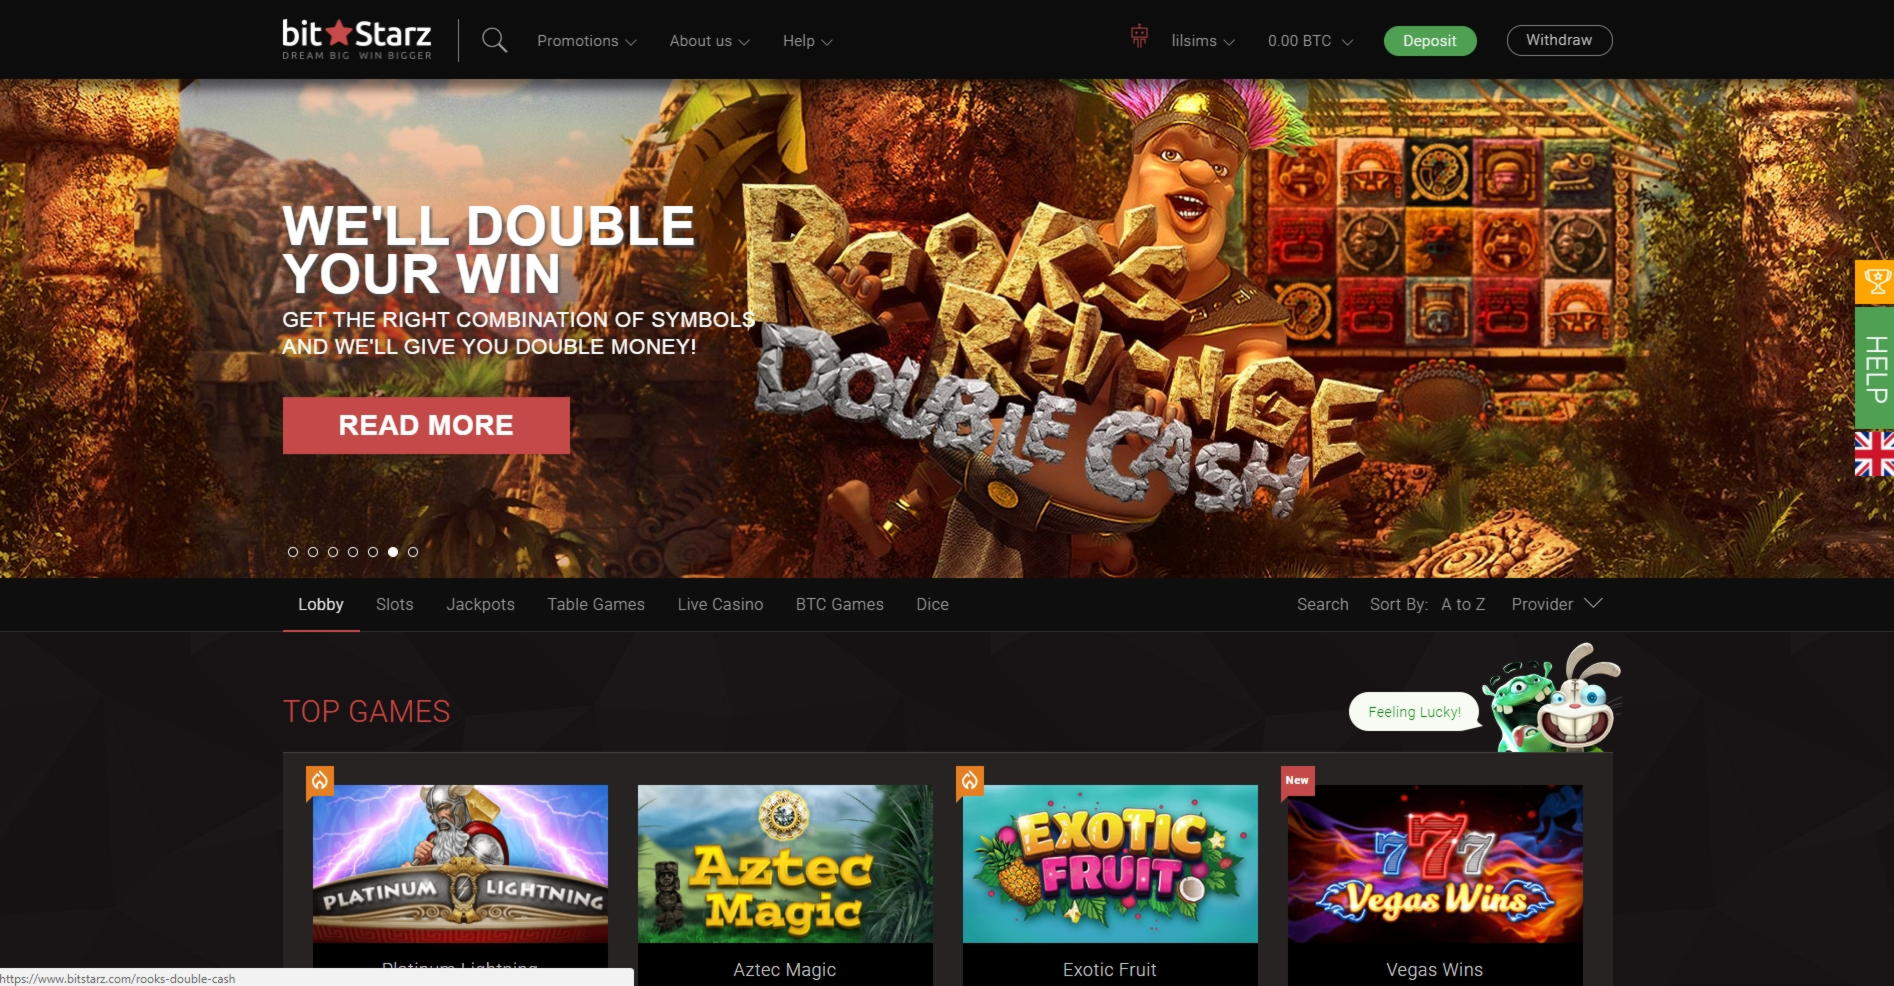 Treasure Island Jackpotlarında £ 75 Ücretsiz Casino Bileti (Sloto Nakit Ayna)